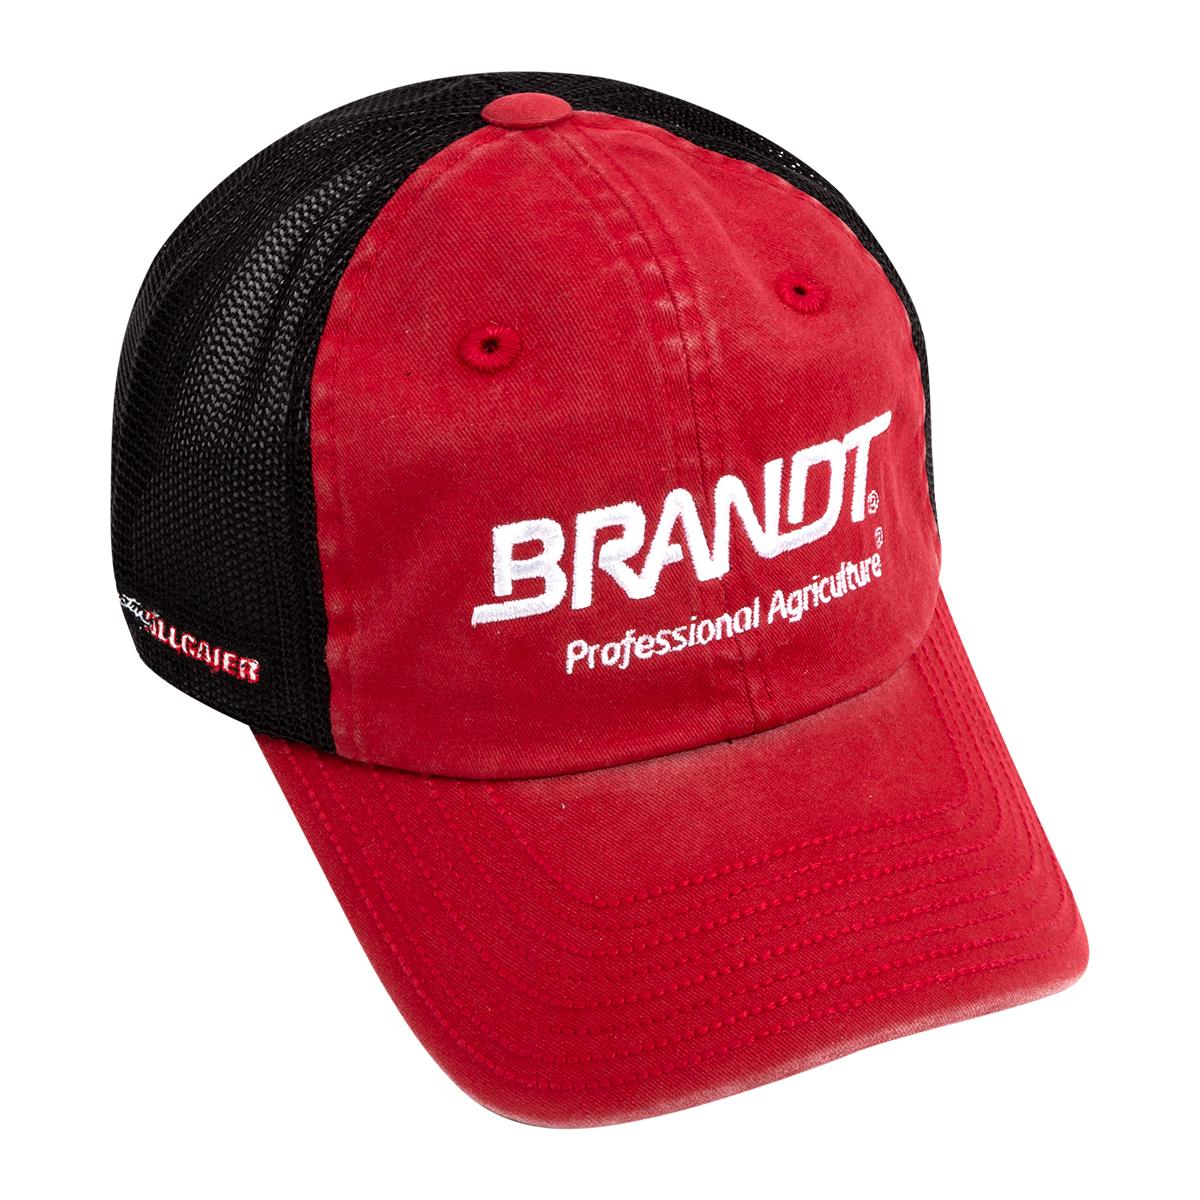 Justin Allgaier 2018 Xfinity Brandt Vintage Trucker Hat